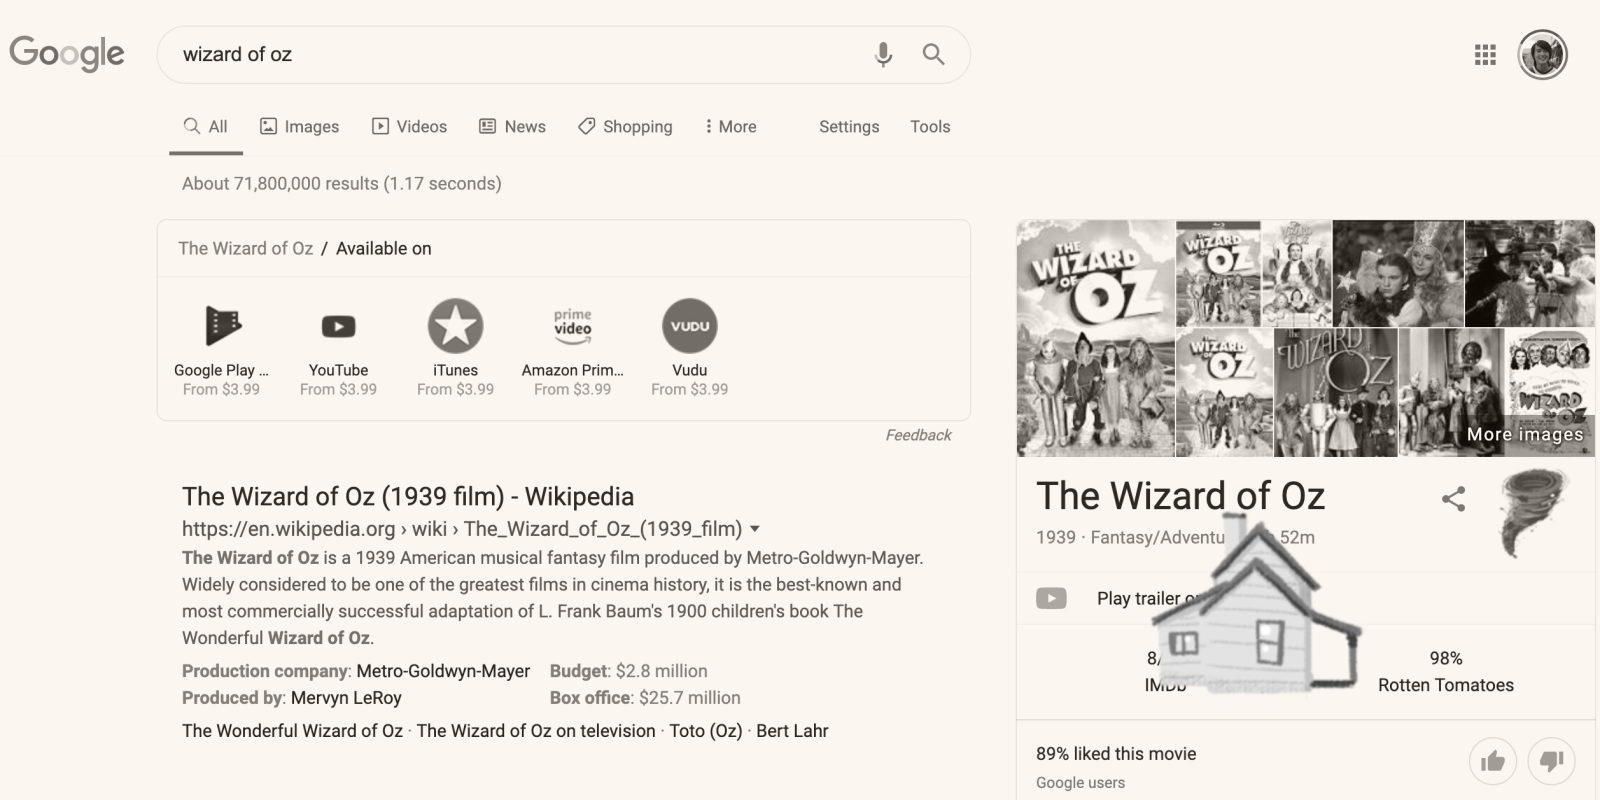 Easter Egg Google Wizard Of Oz